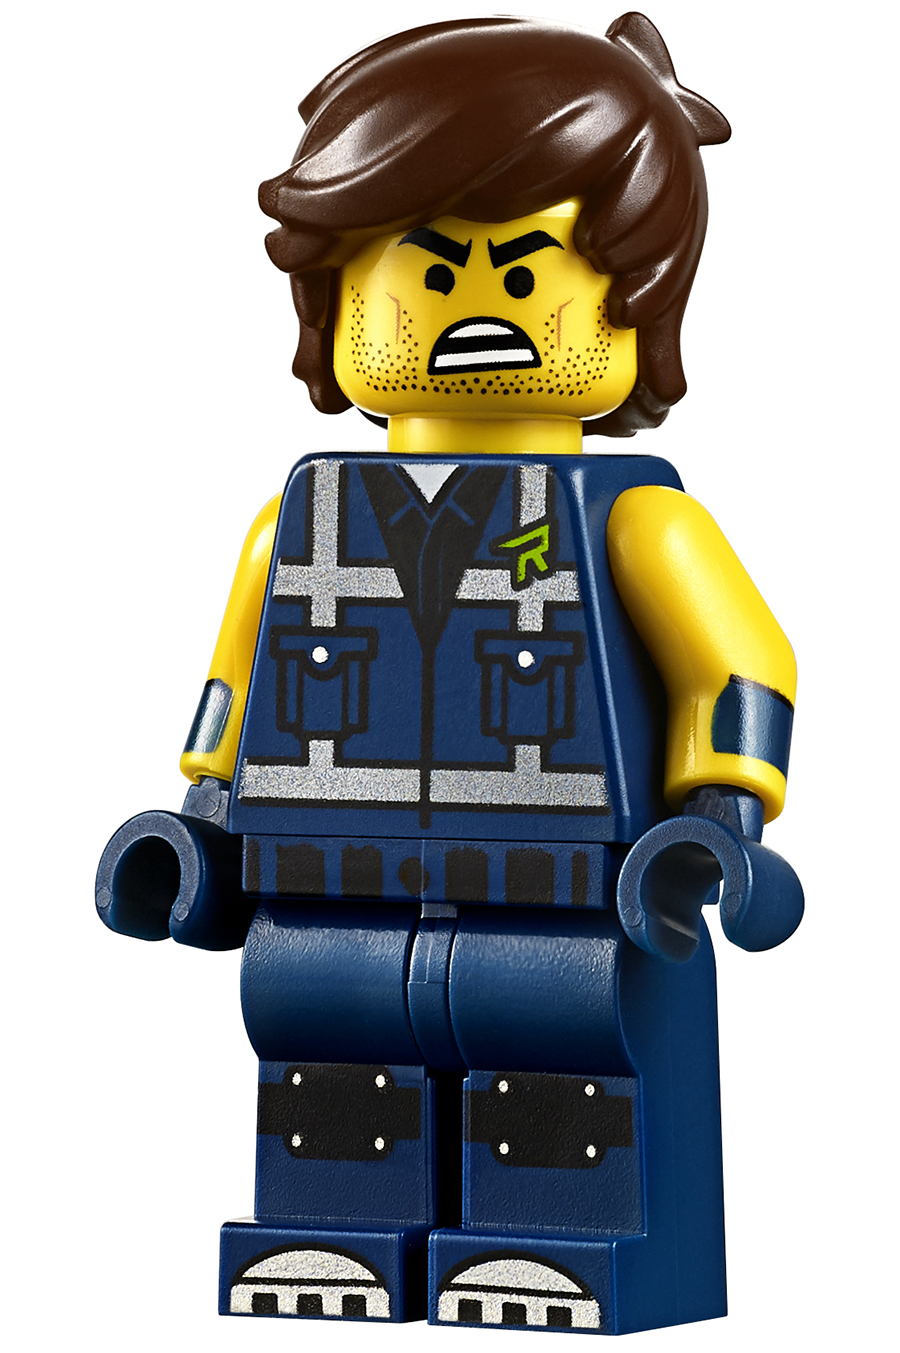 New Lego Set Revealed At London Toy Fair Bricksfanz